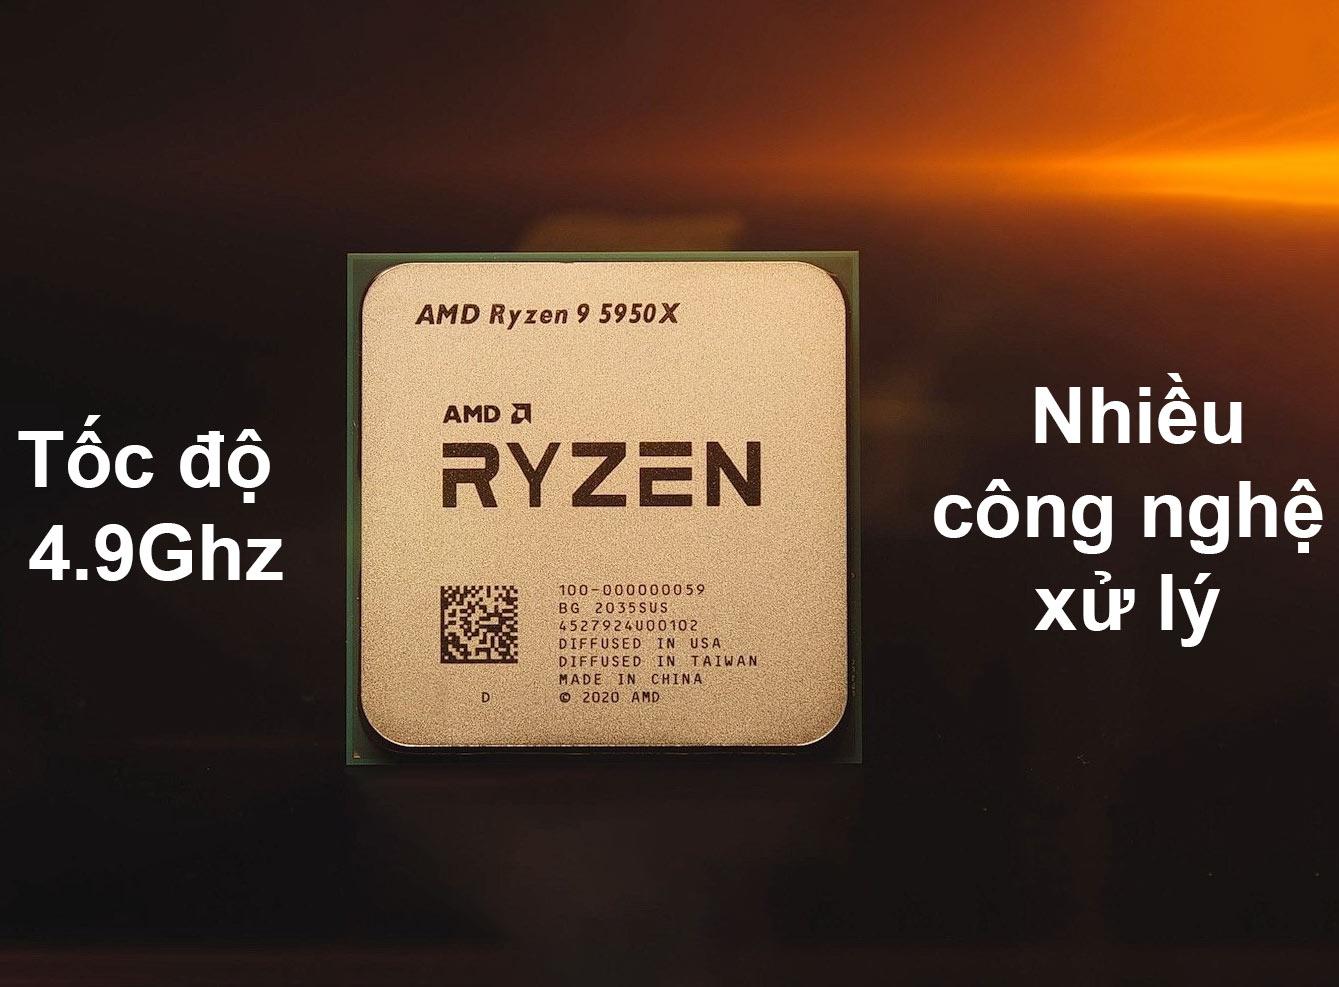 CPU AMD Ryzen 9 5950X | Tốc độ 4.9Ghz